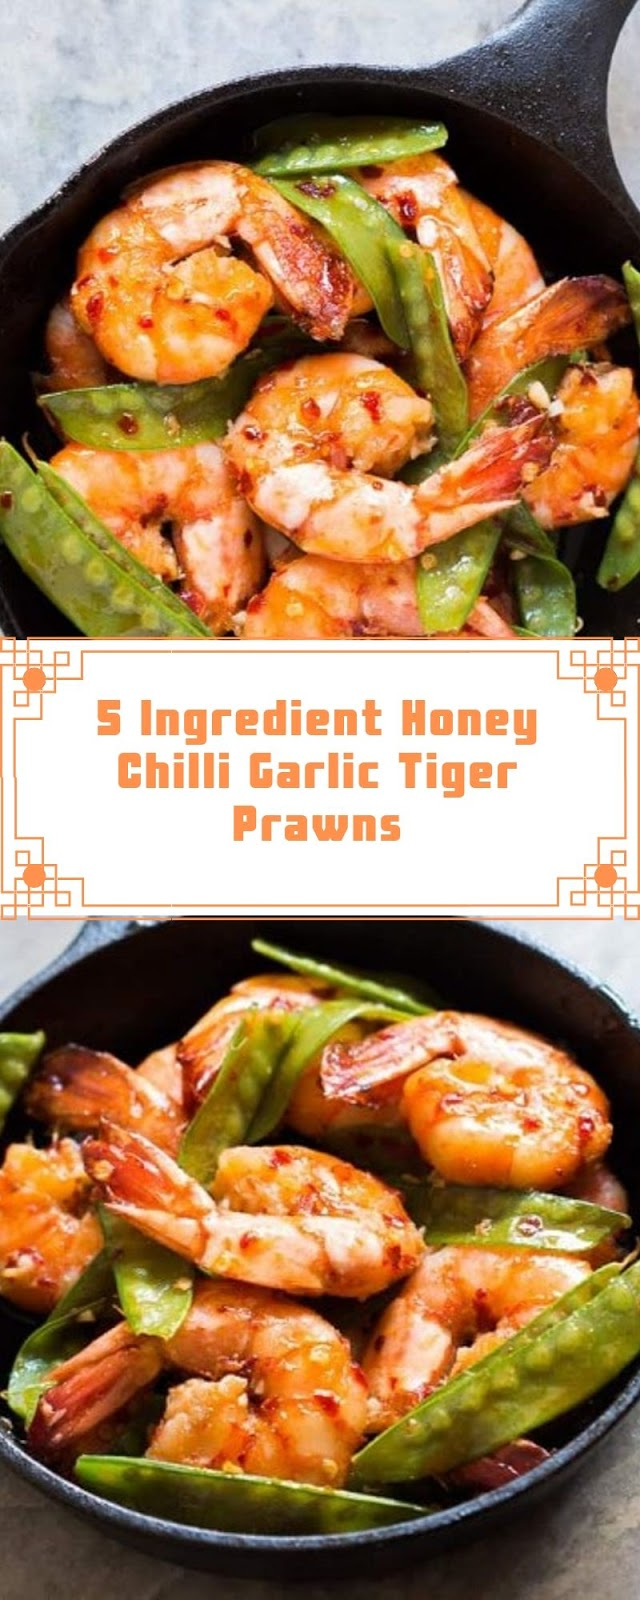 5 Ingredient Honey Chilli Garlic Tiger Prawns